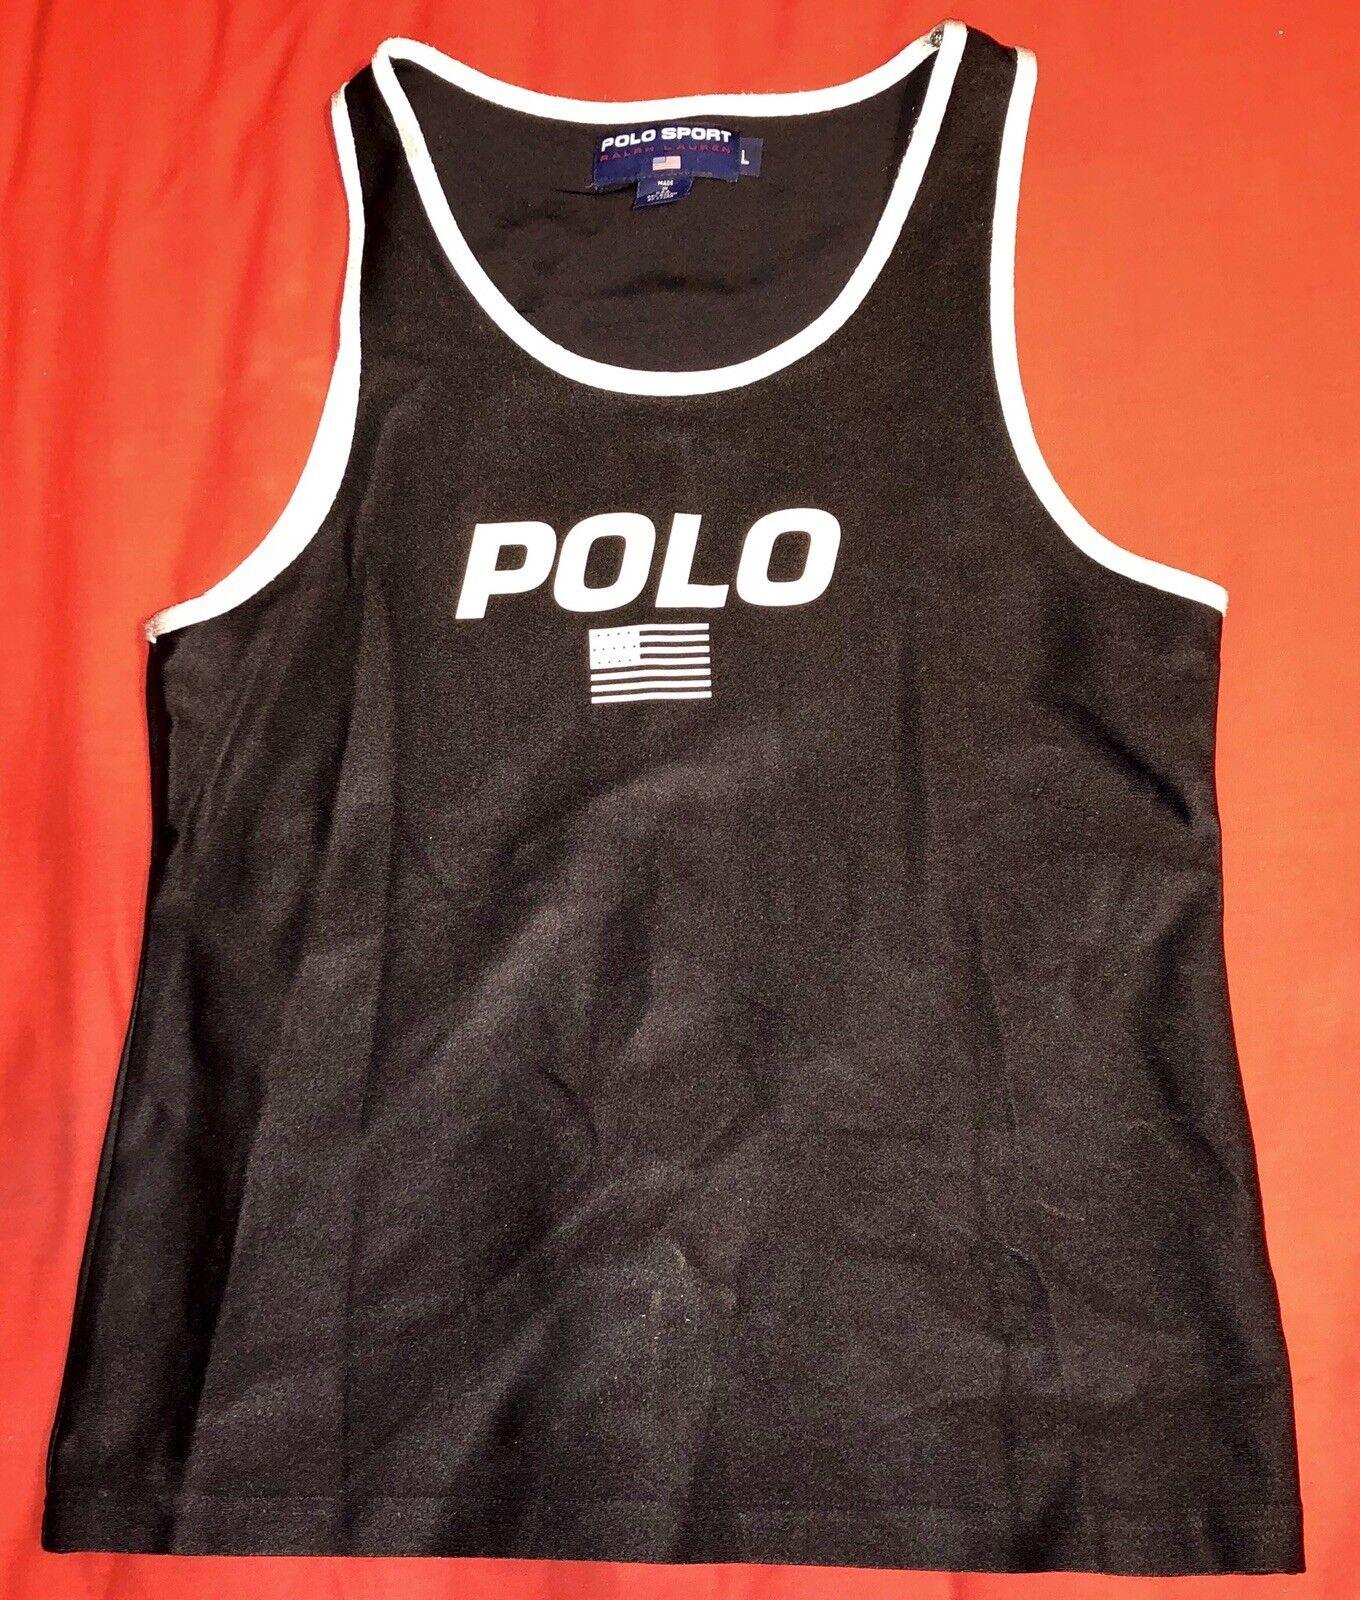 Vintage 90s Polo Sport Ralph Lauren Mens Sz L Jersey Shirt